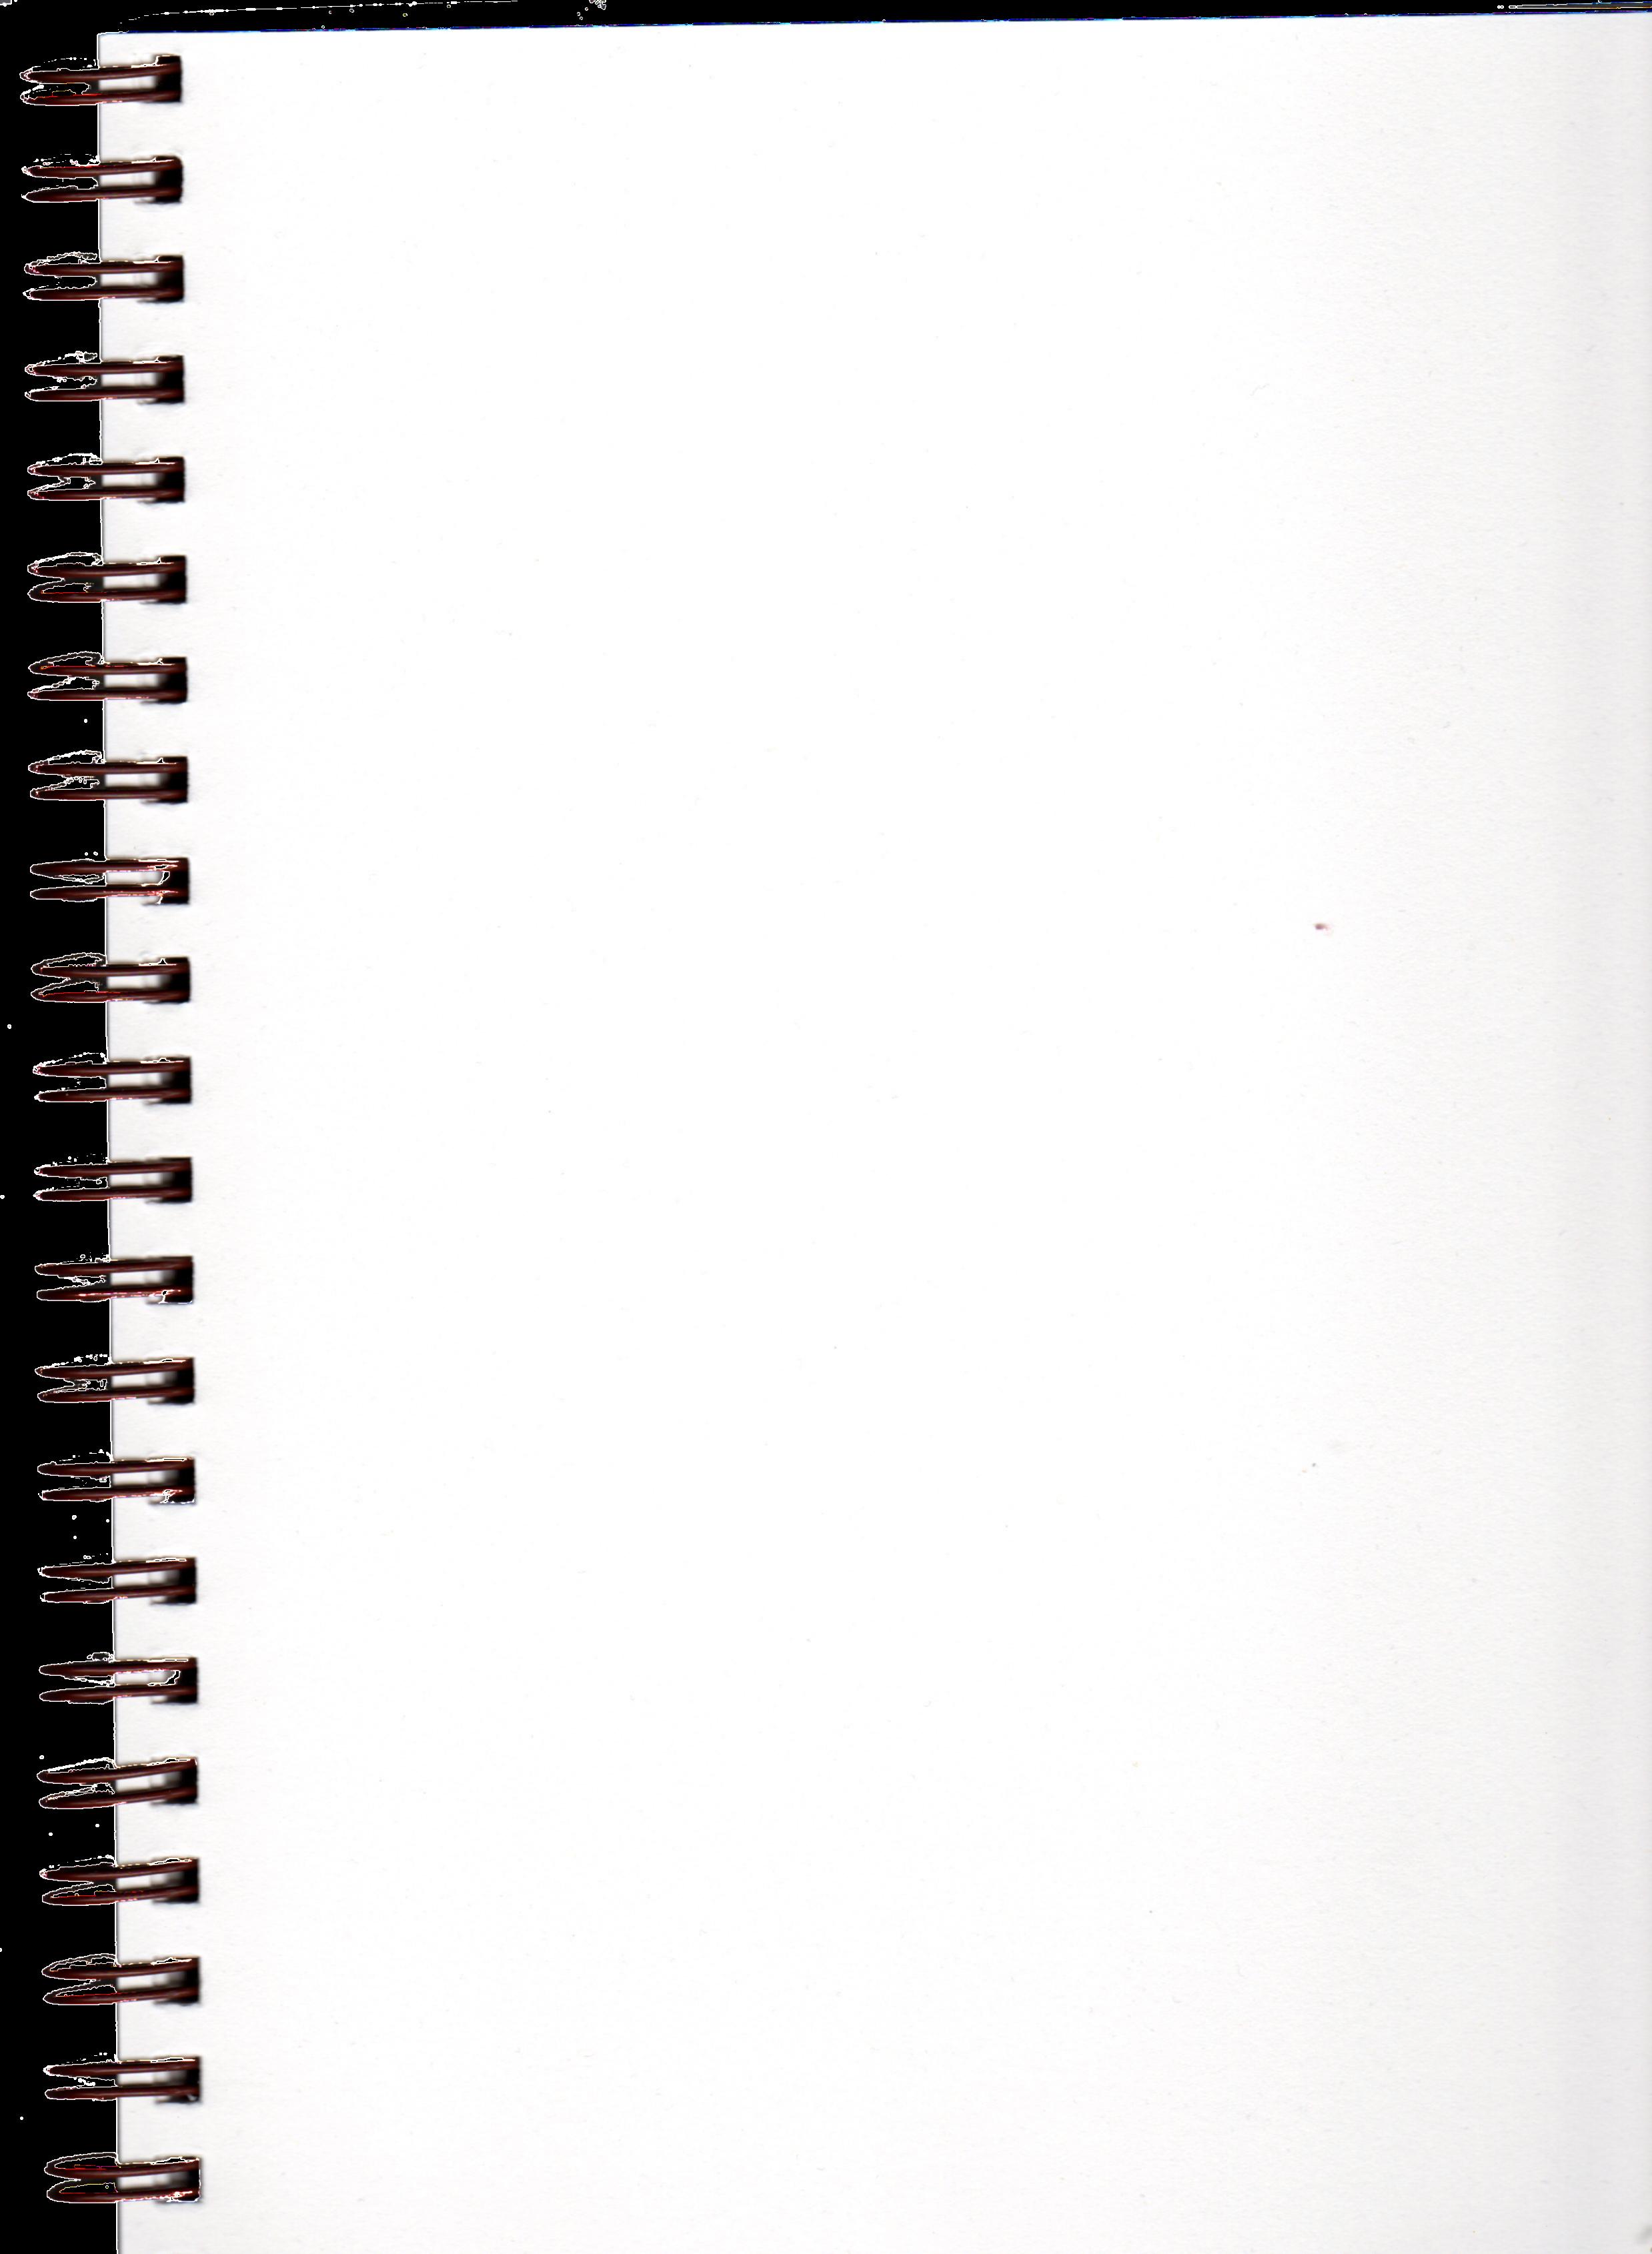 Pre Cut Blank Spiral Notebook Page By Bnspyrd On Deviantart